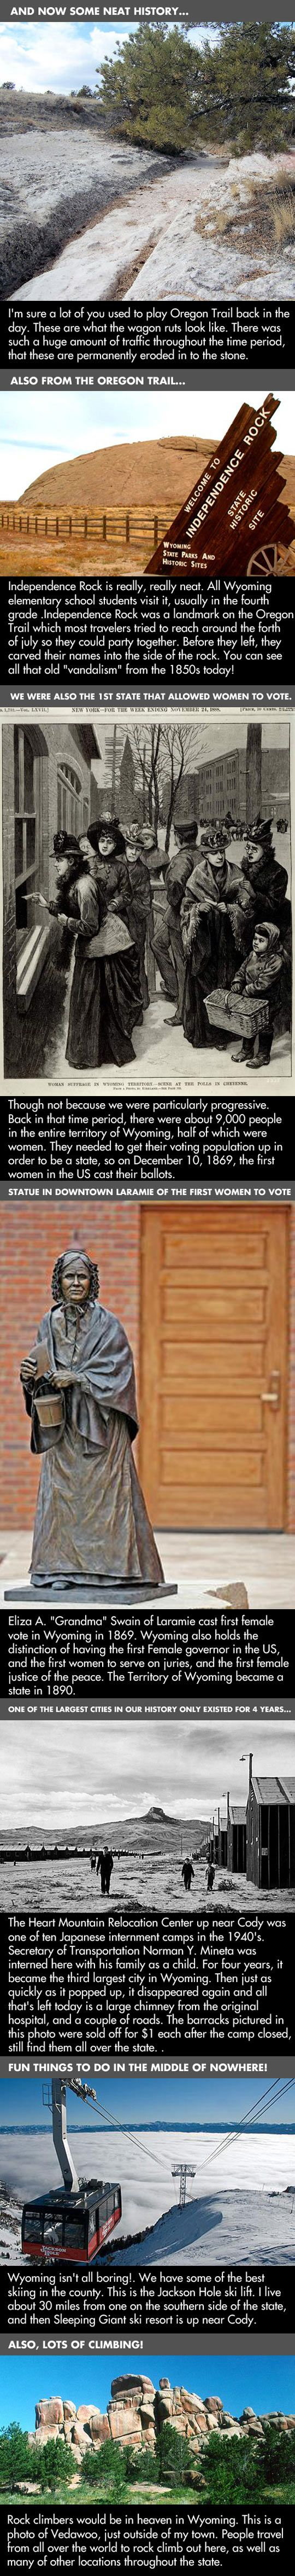 Laramie, WY -- Eliza A. (Grandma) Swain - cast first female vote in Wyoming in 1869